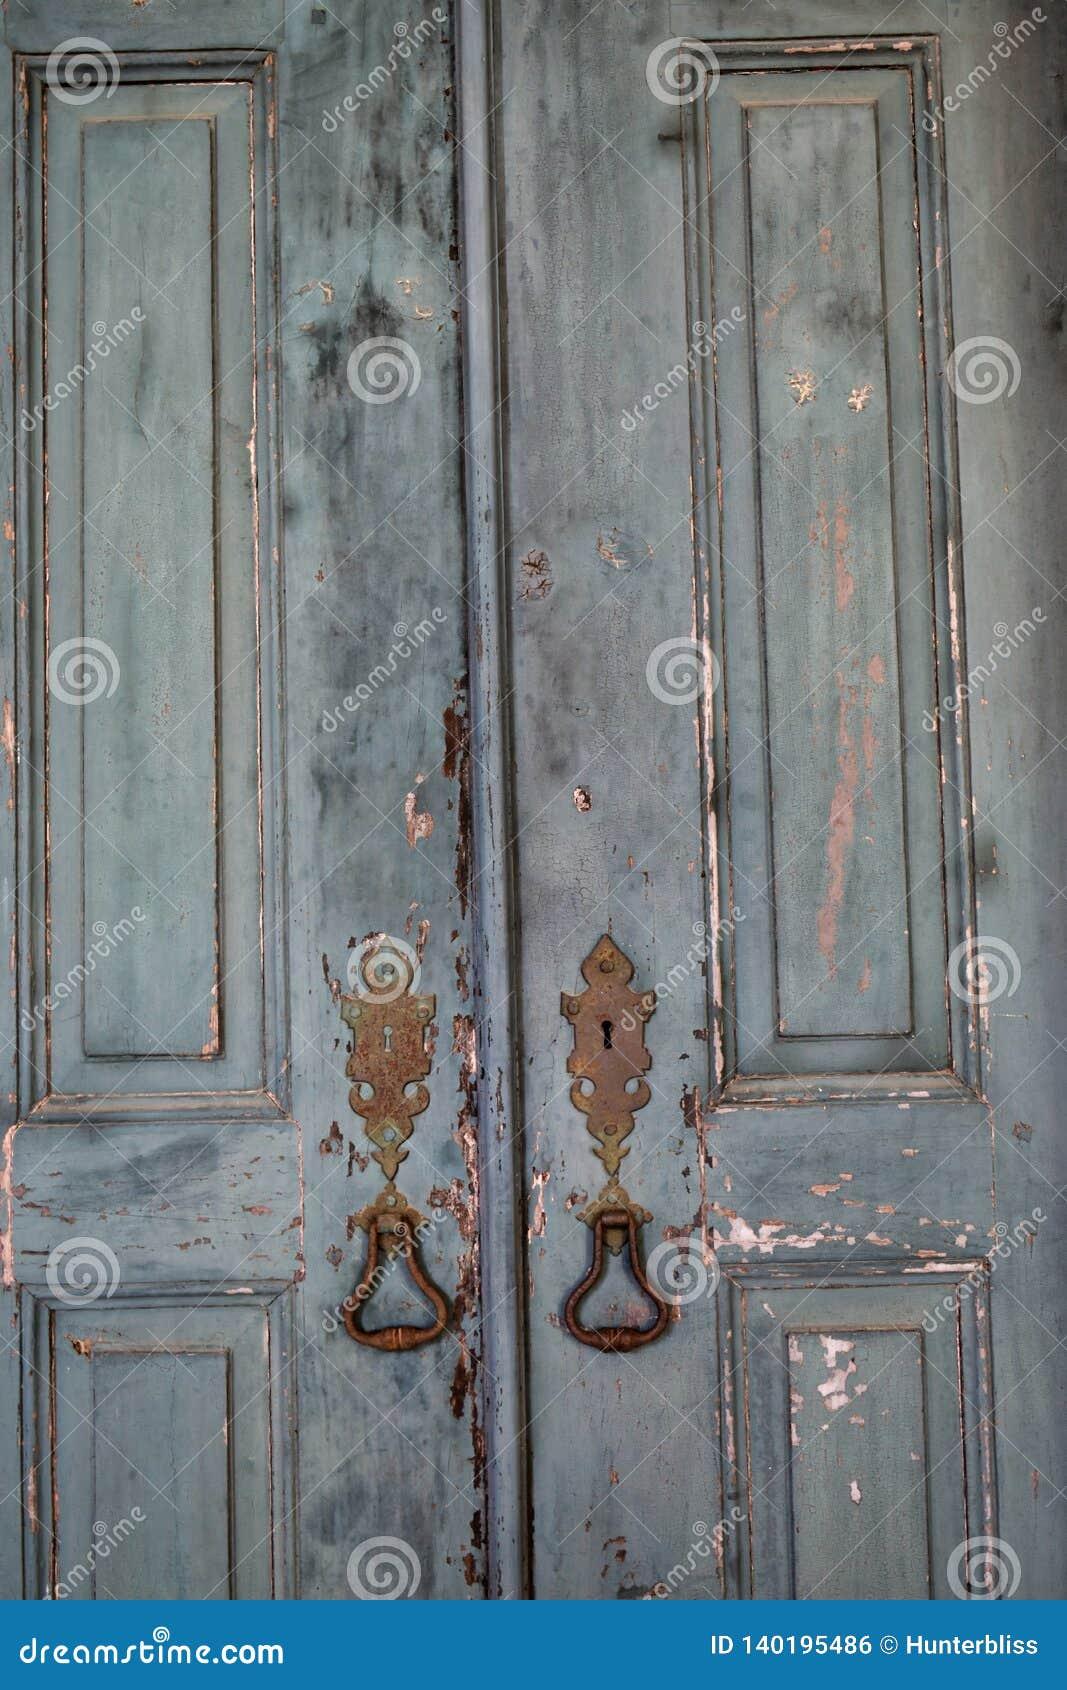 Antique Vintage Doors Ruined Withered Worn Handles Closeup Textures